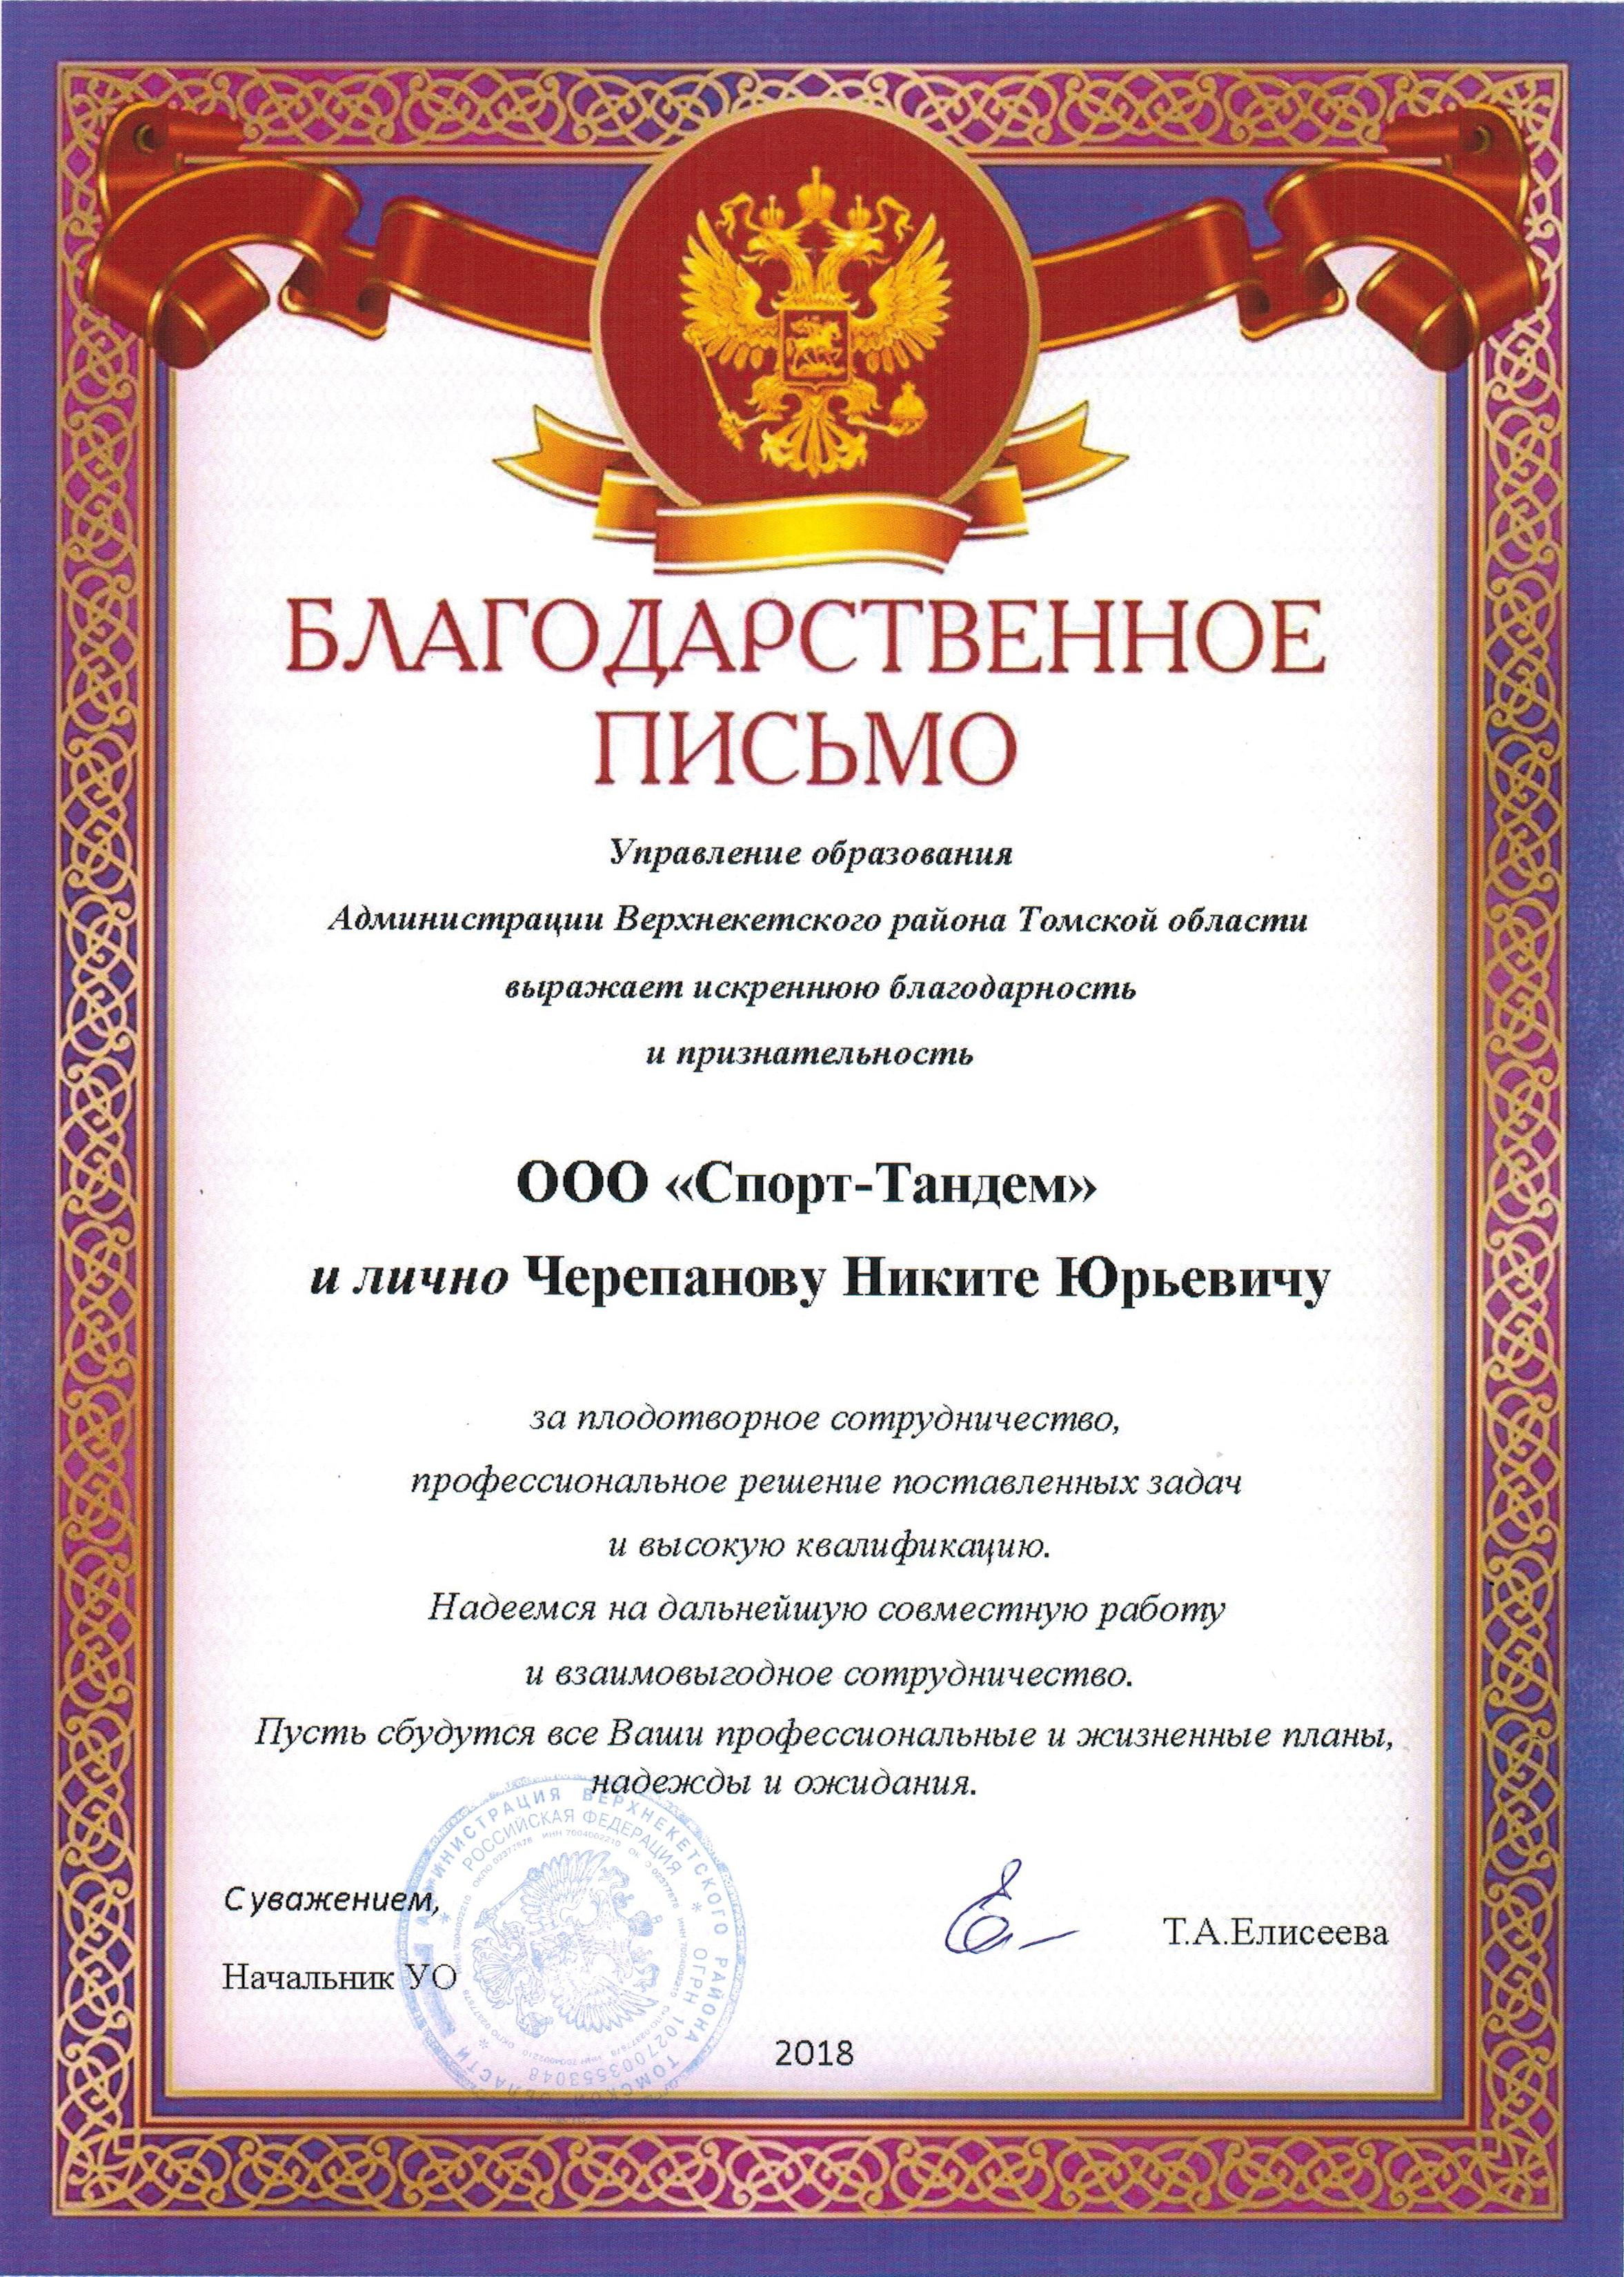 УО Томской области